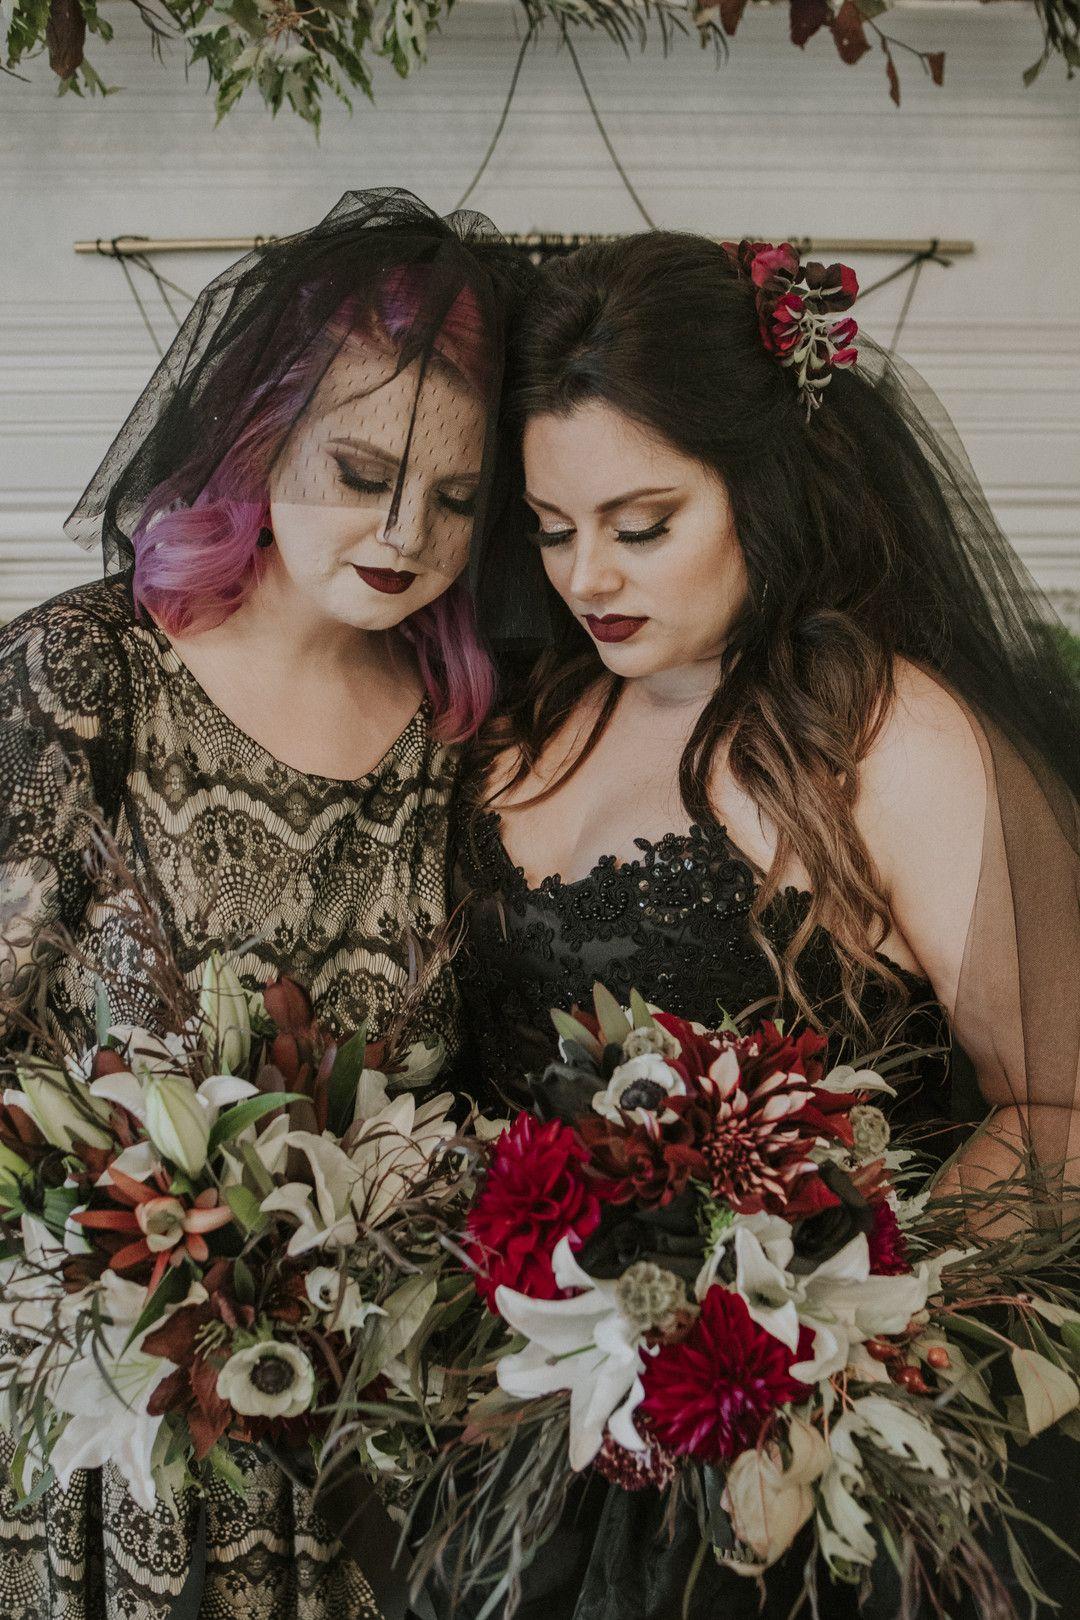 CLASSY DARK & MOODY HALLOWEEN WEDDING IDEAS Bride